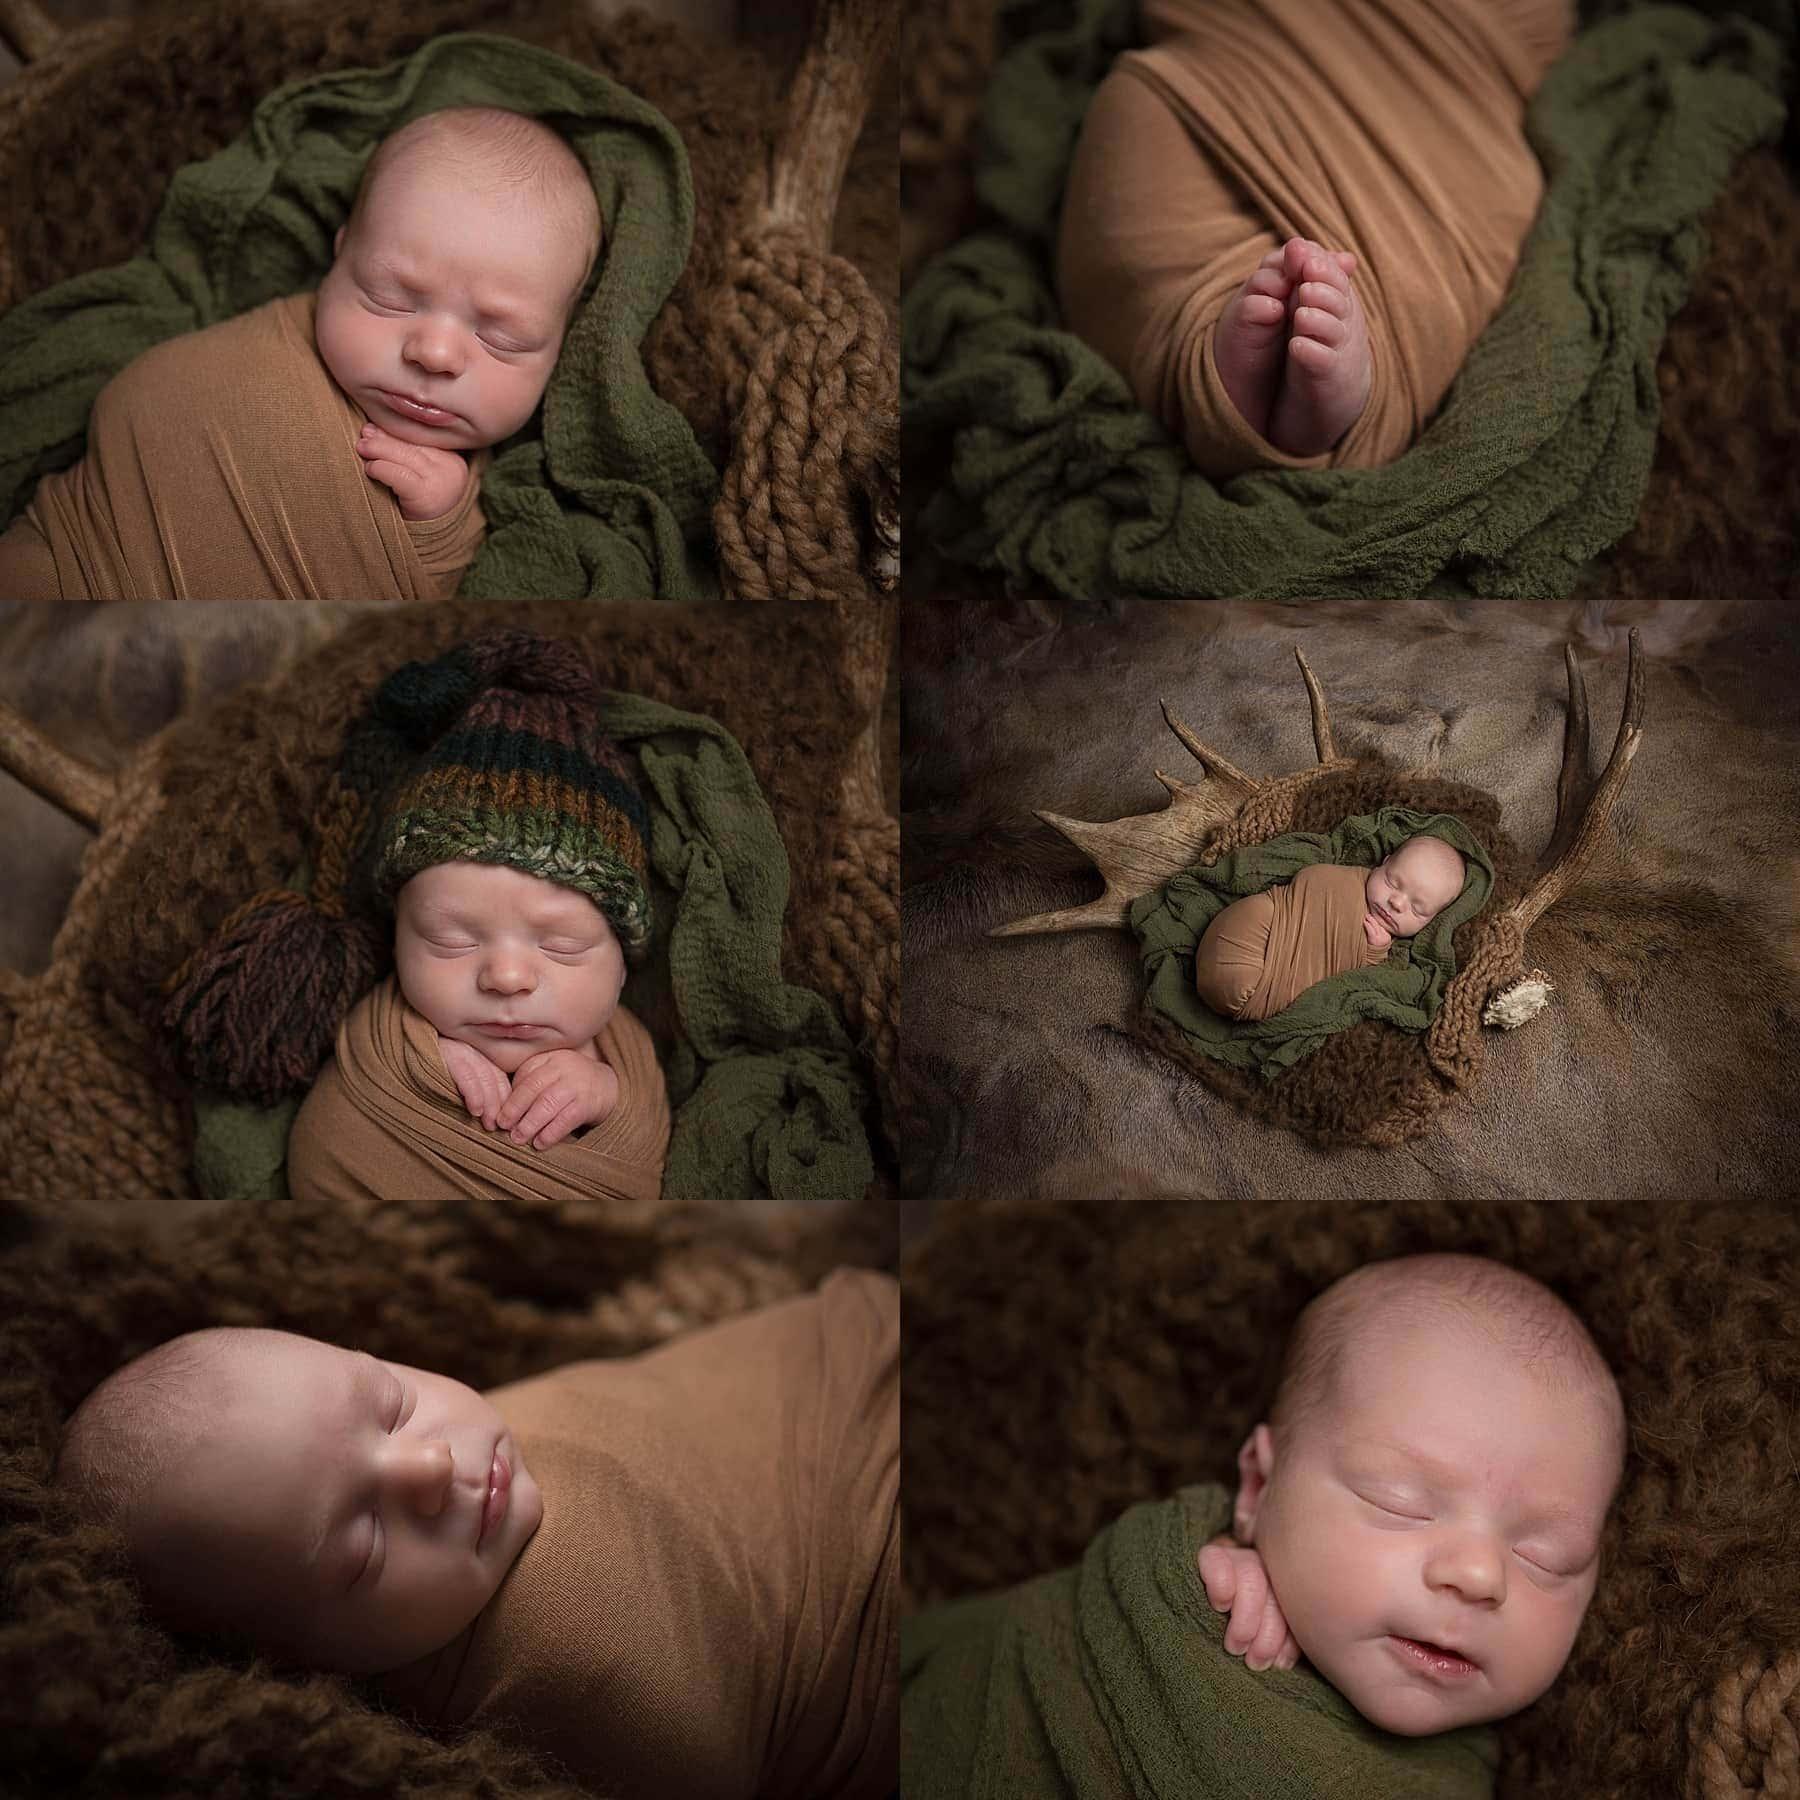 baby boy newborn photo session at home in San Antonio, Texas